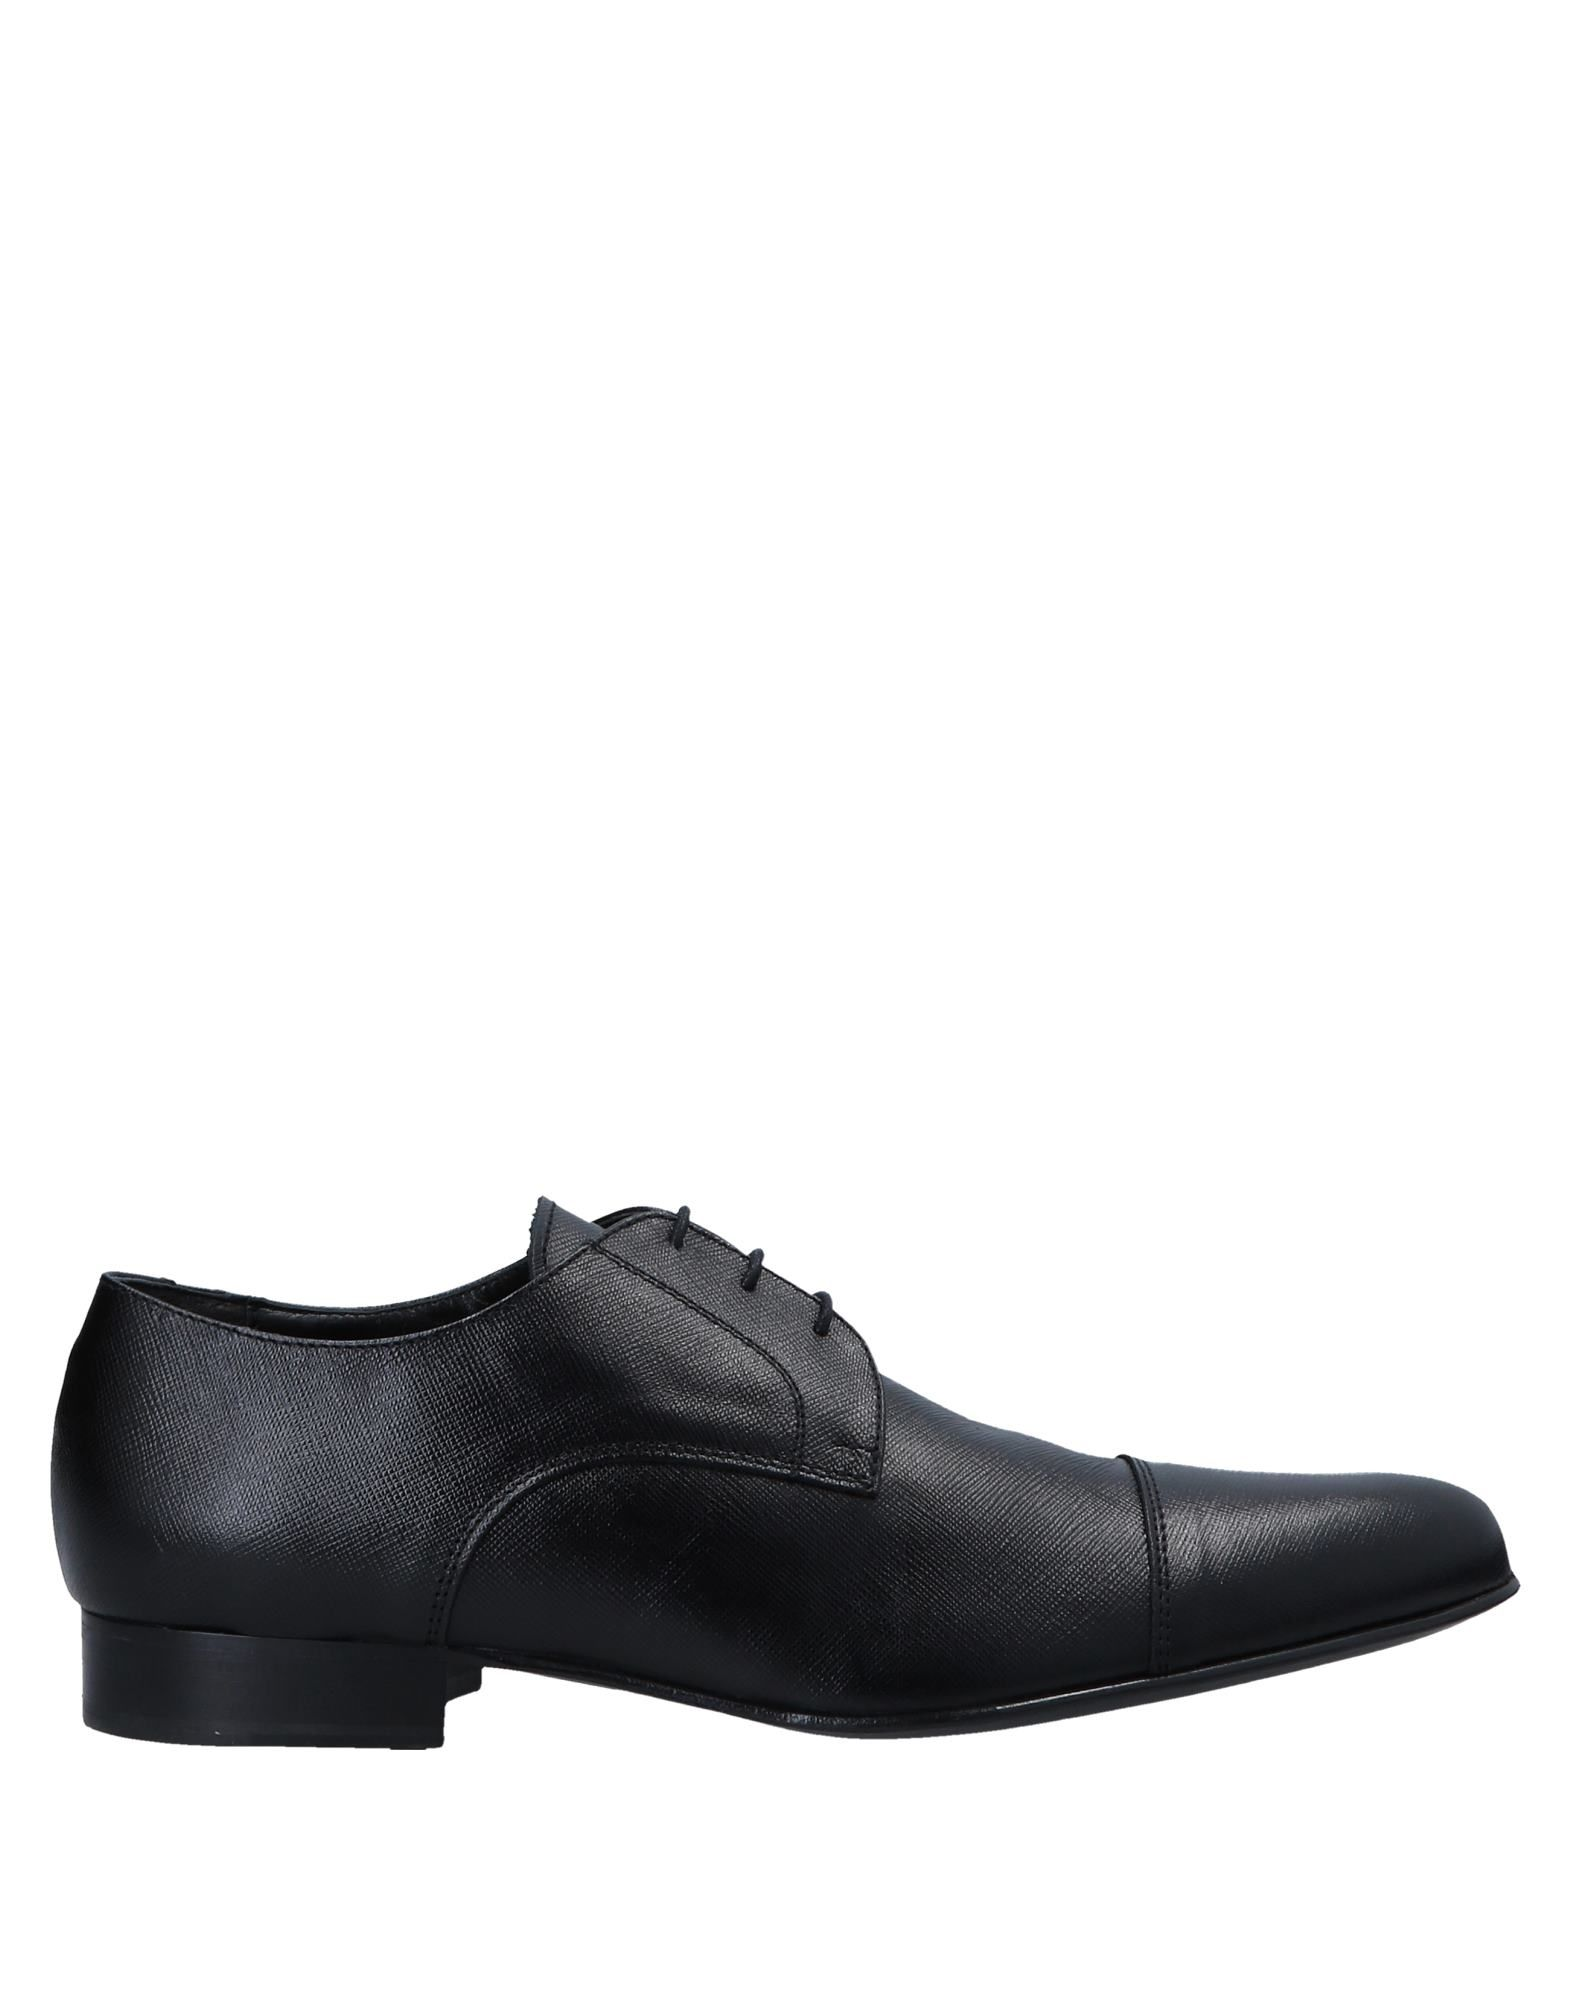 Rabatt echte Schuhe Eleven Schnürschuhe Herren  11549145UT